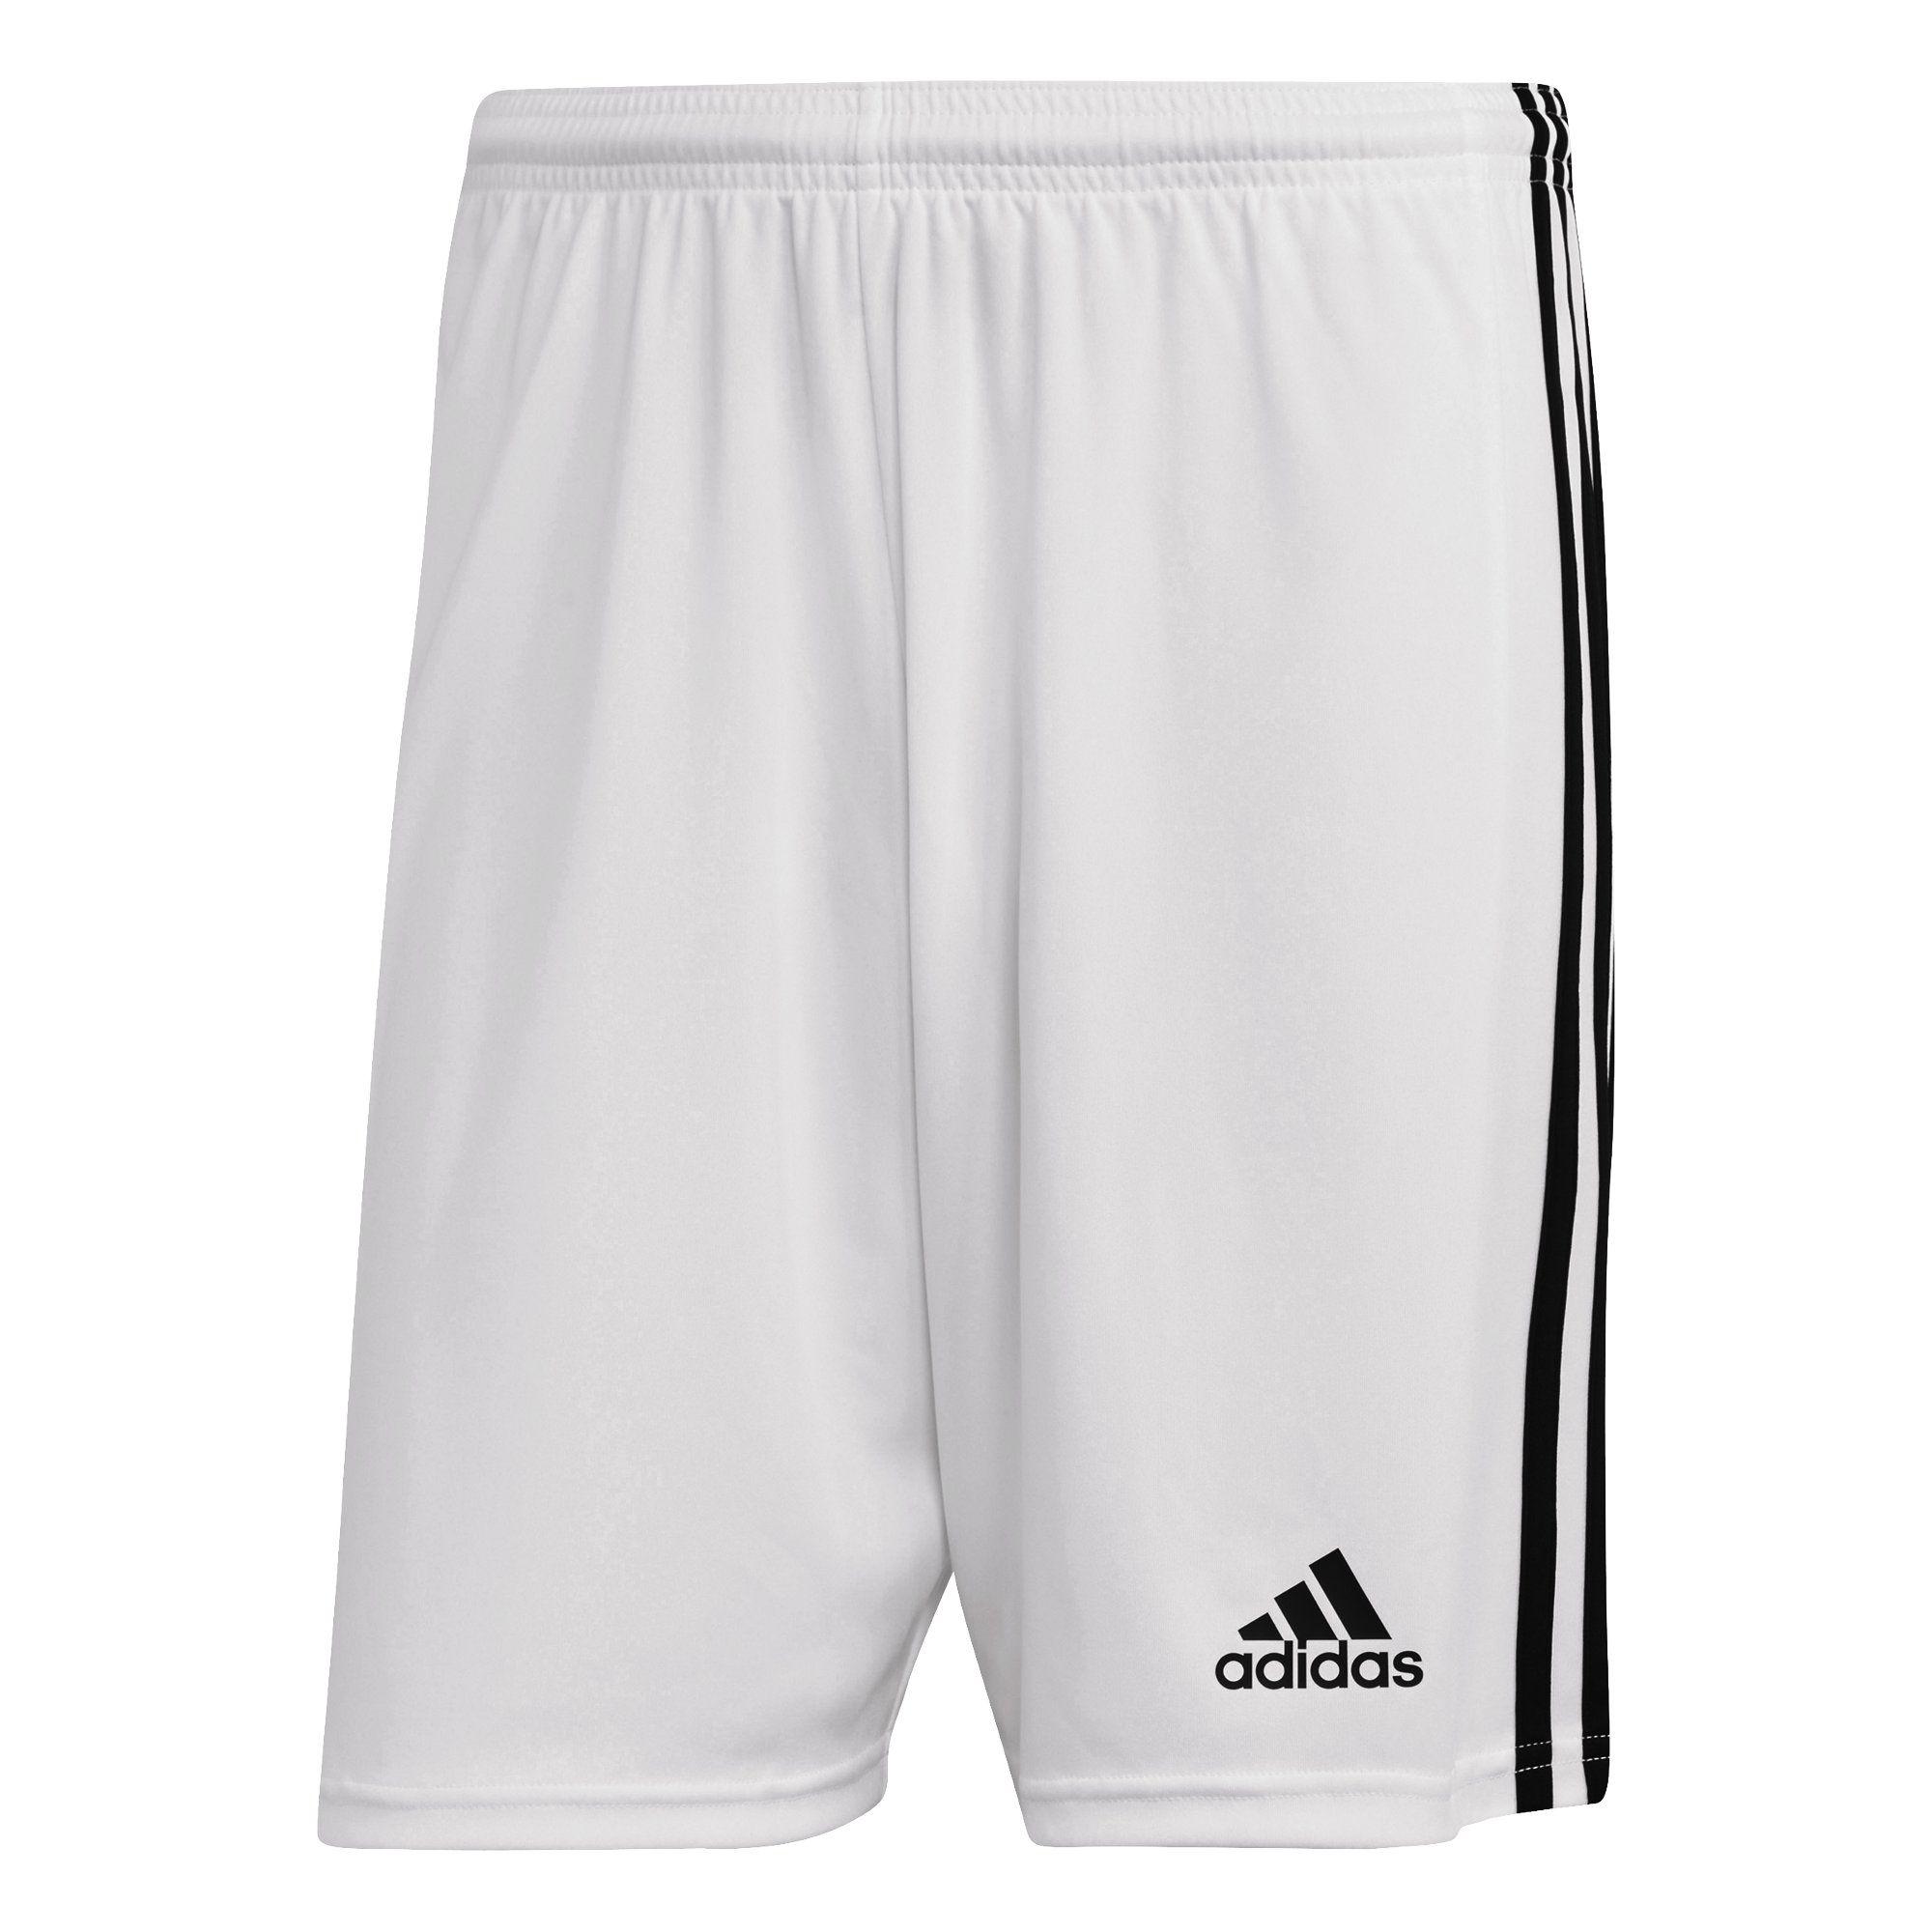 adidas Squadra 21 Voetbalbroekje Wit Zwart